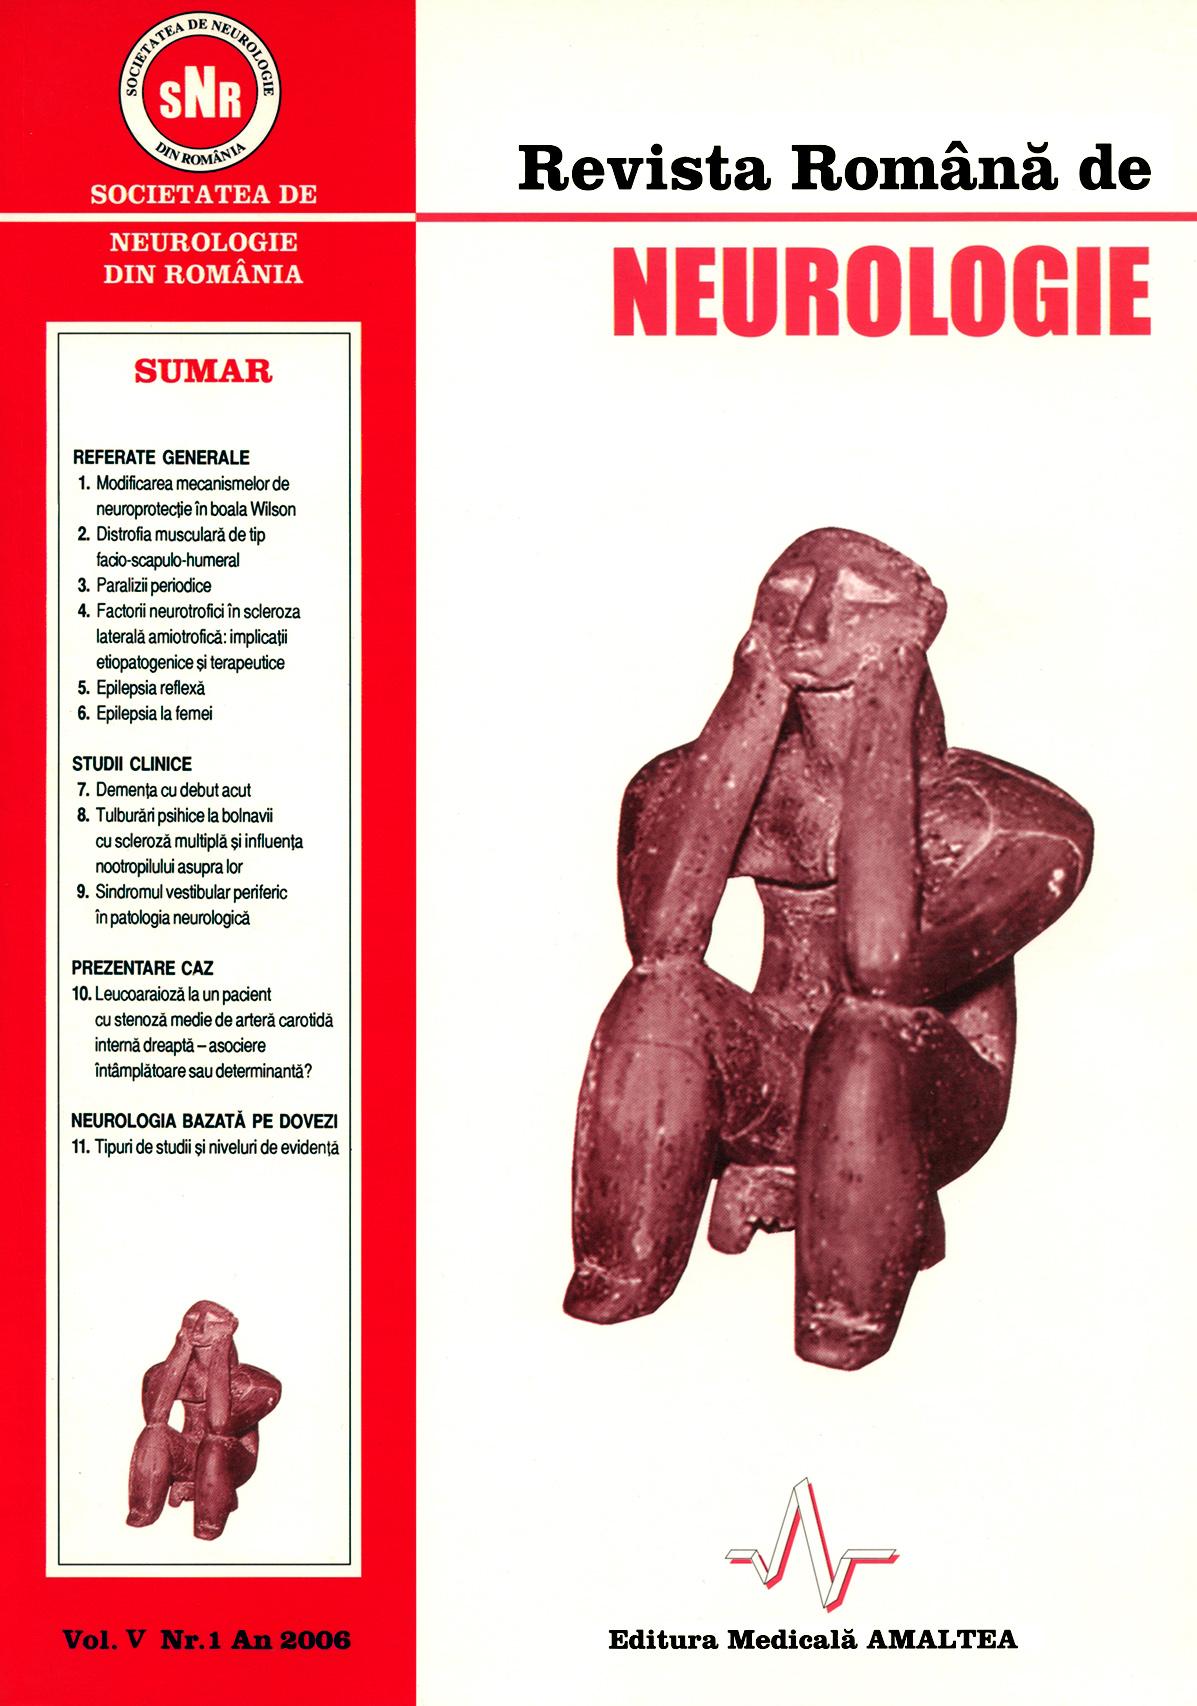 Romanian Journal of Neurology, Volume V, No. 1, 2006